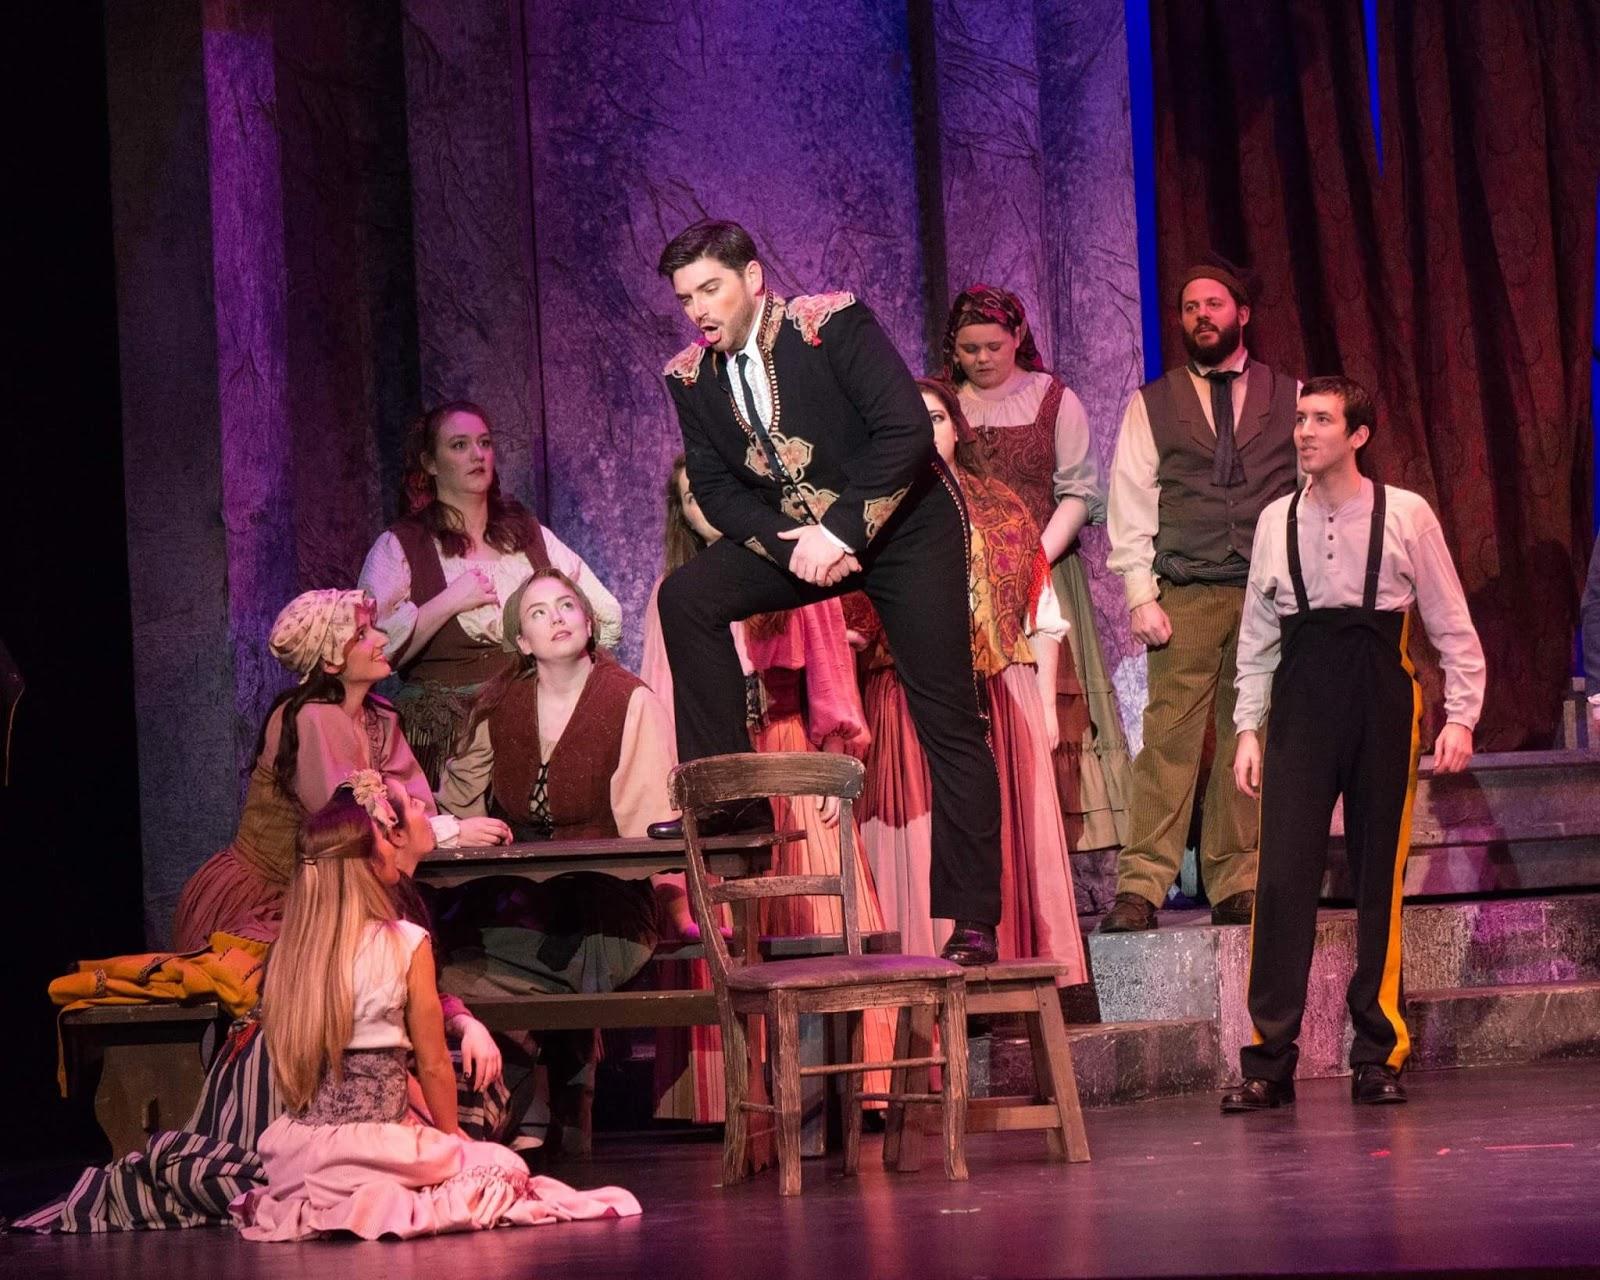 IN PERFORMANCE: Baritone DAVID PERSHALL as Escamillo (center) in Greensboro Opera's production of Georges Bizet's CARMEN, January 2017 [Photo © by Greensboro Opera]